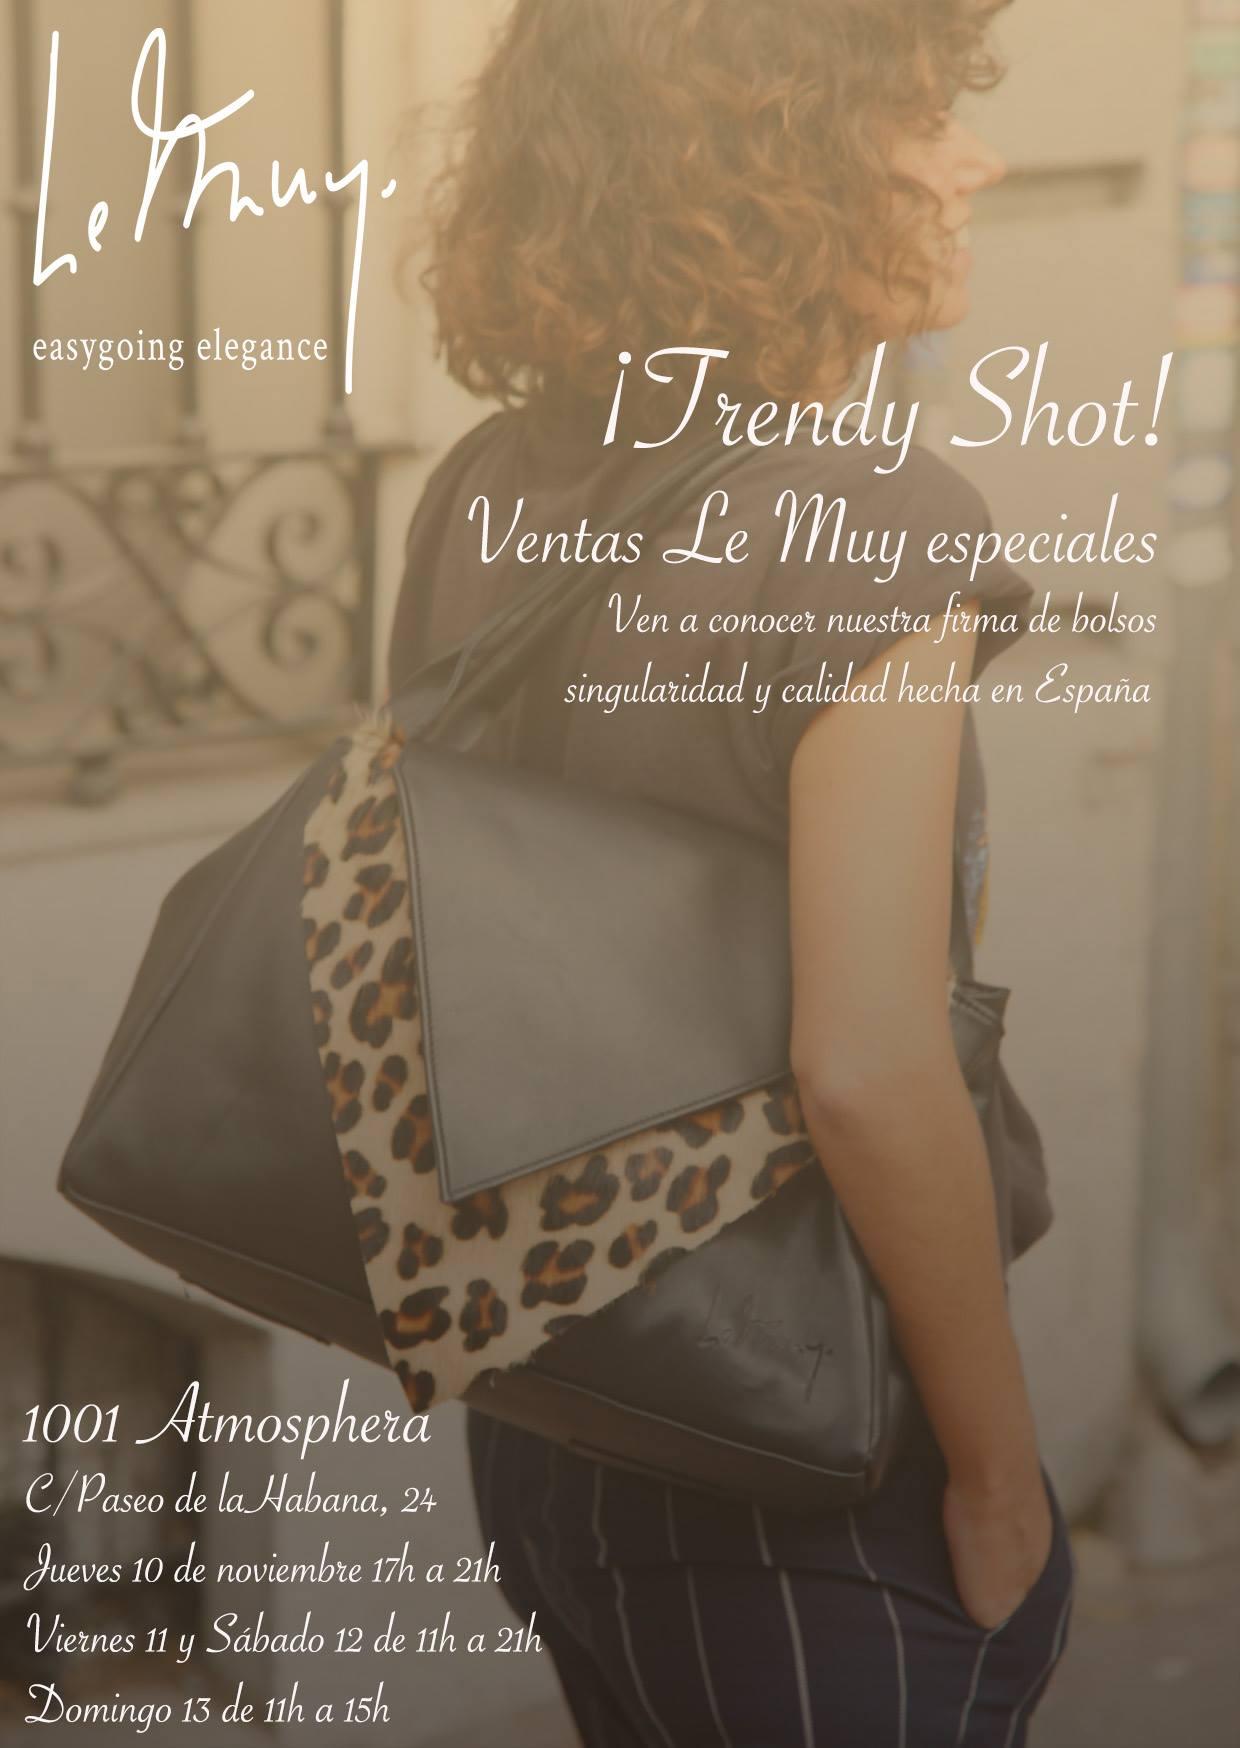 flyer-trendy-shot-le-muy-2